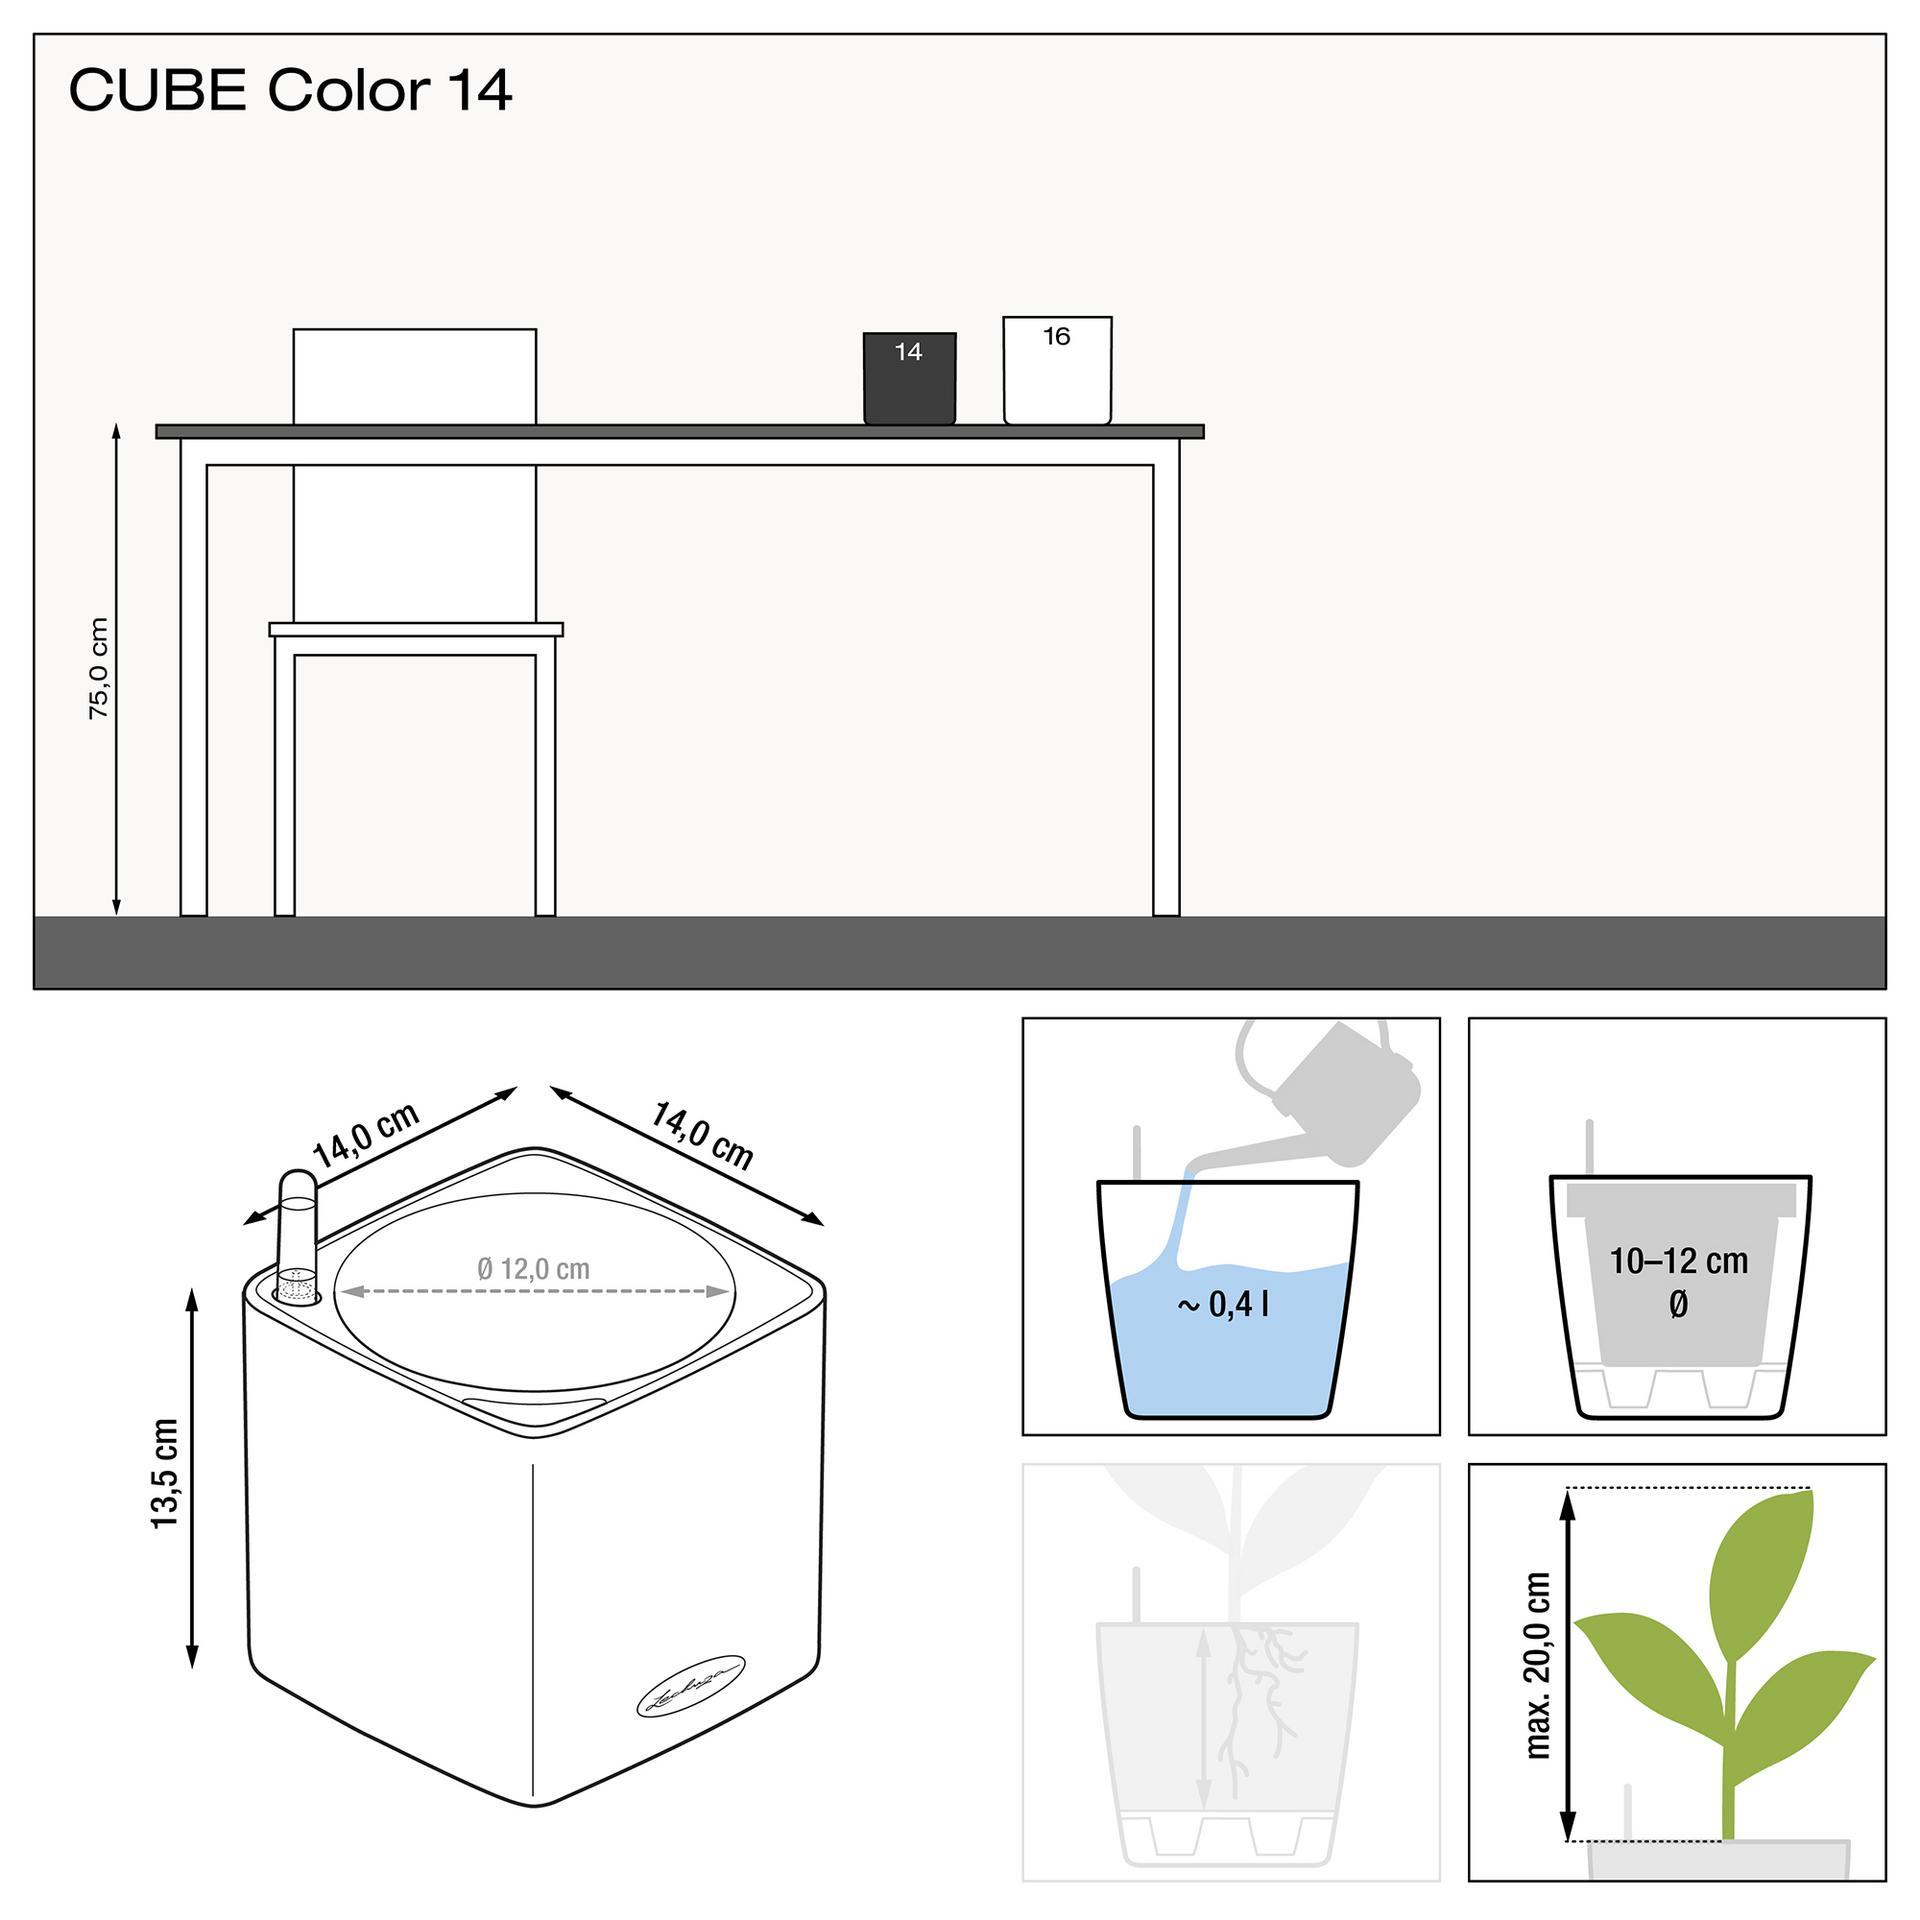 le_cube-color14_product_addi_nz